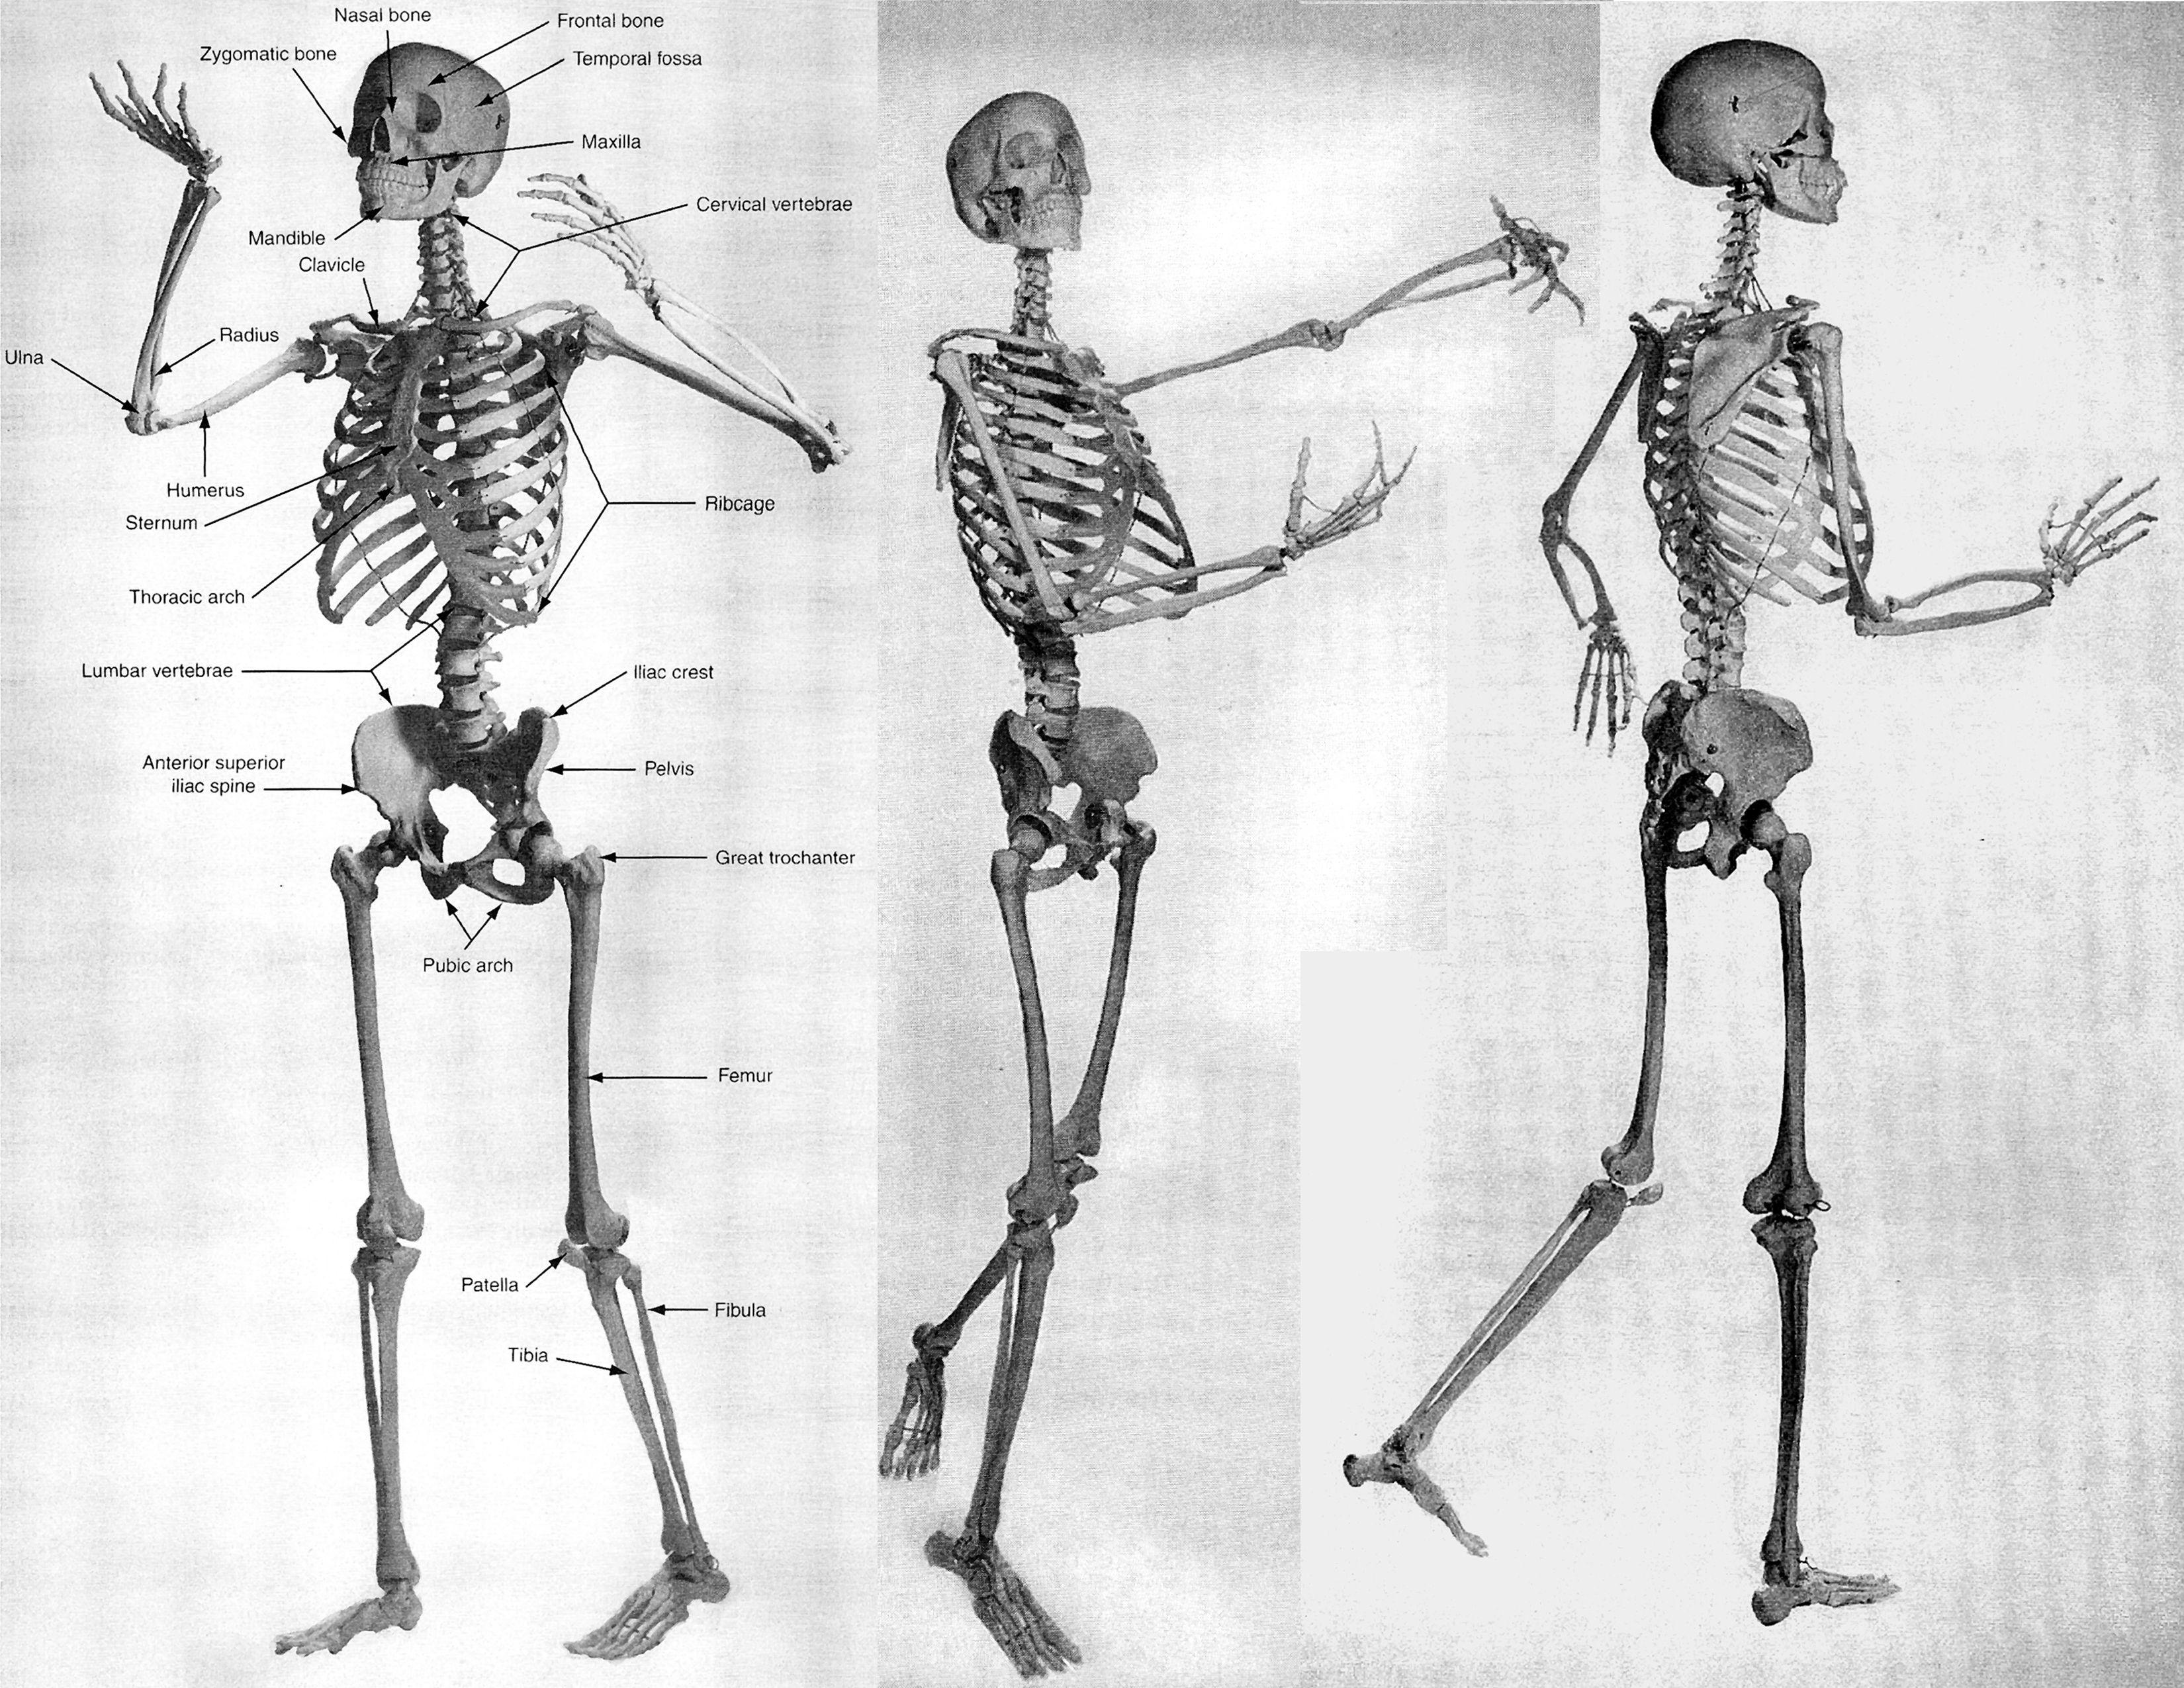 full skeleton diagram jpg 3300 2550 skeleton system human [ 3300 x 2550 Pixel ]